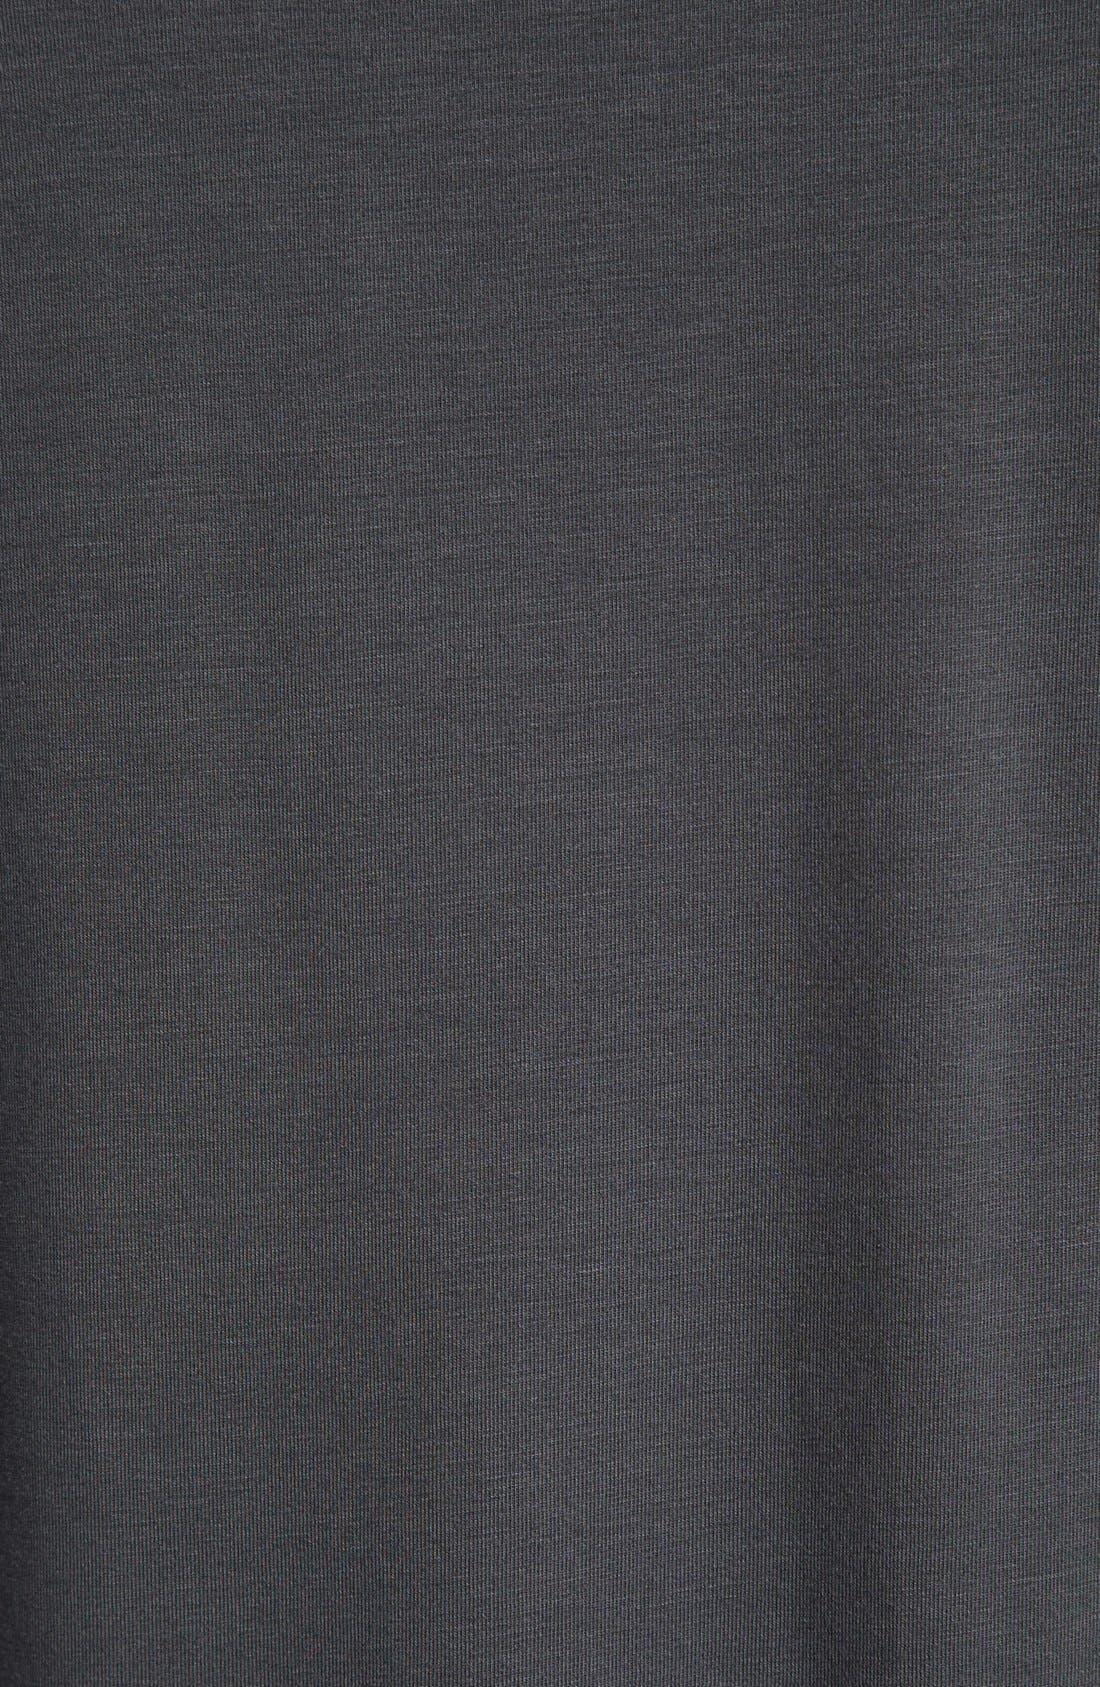 Alternate Image 3  - BOSS HUGO BOSS 'Innovation 2' Short Sleeve T-Shirt